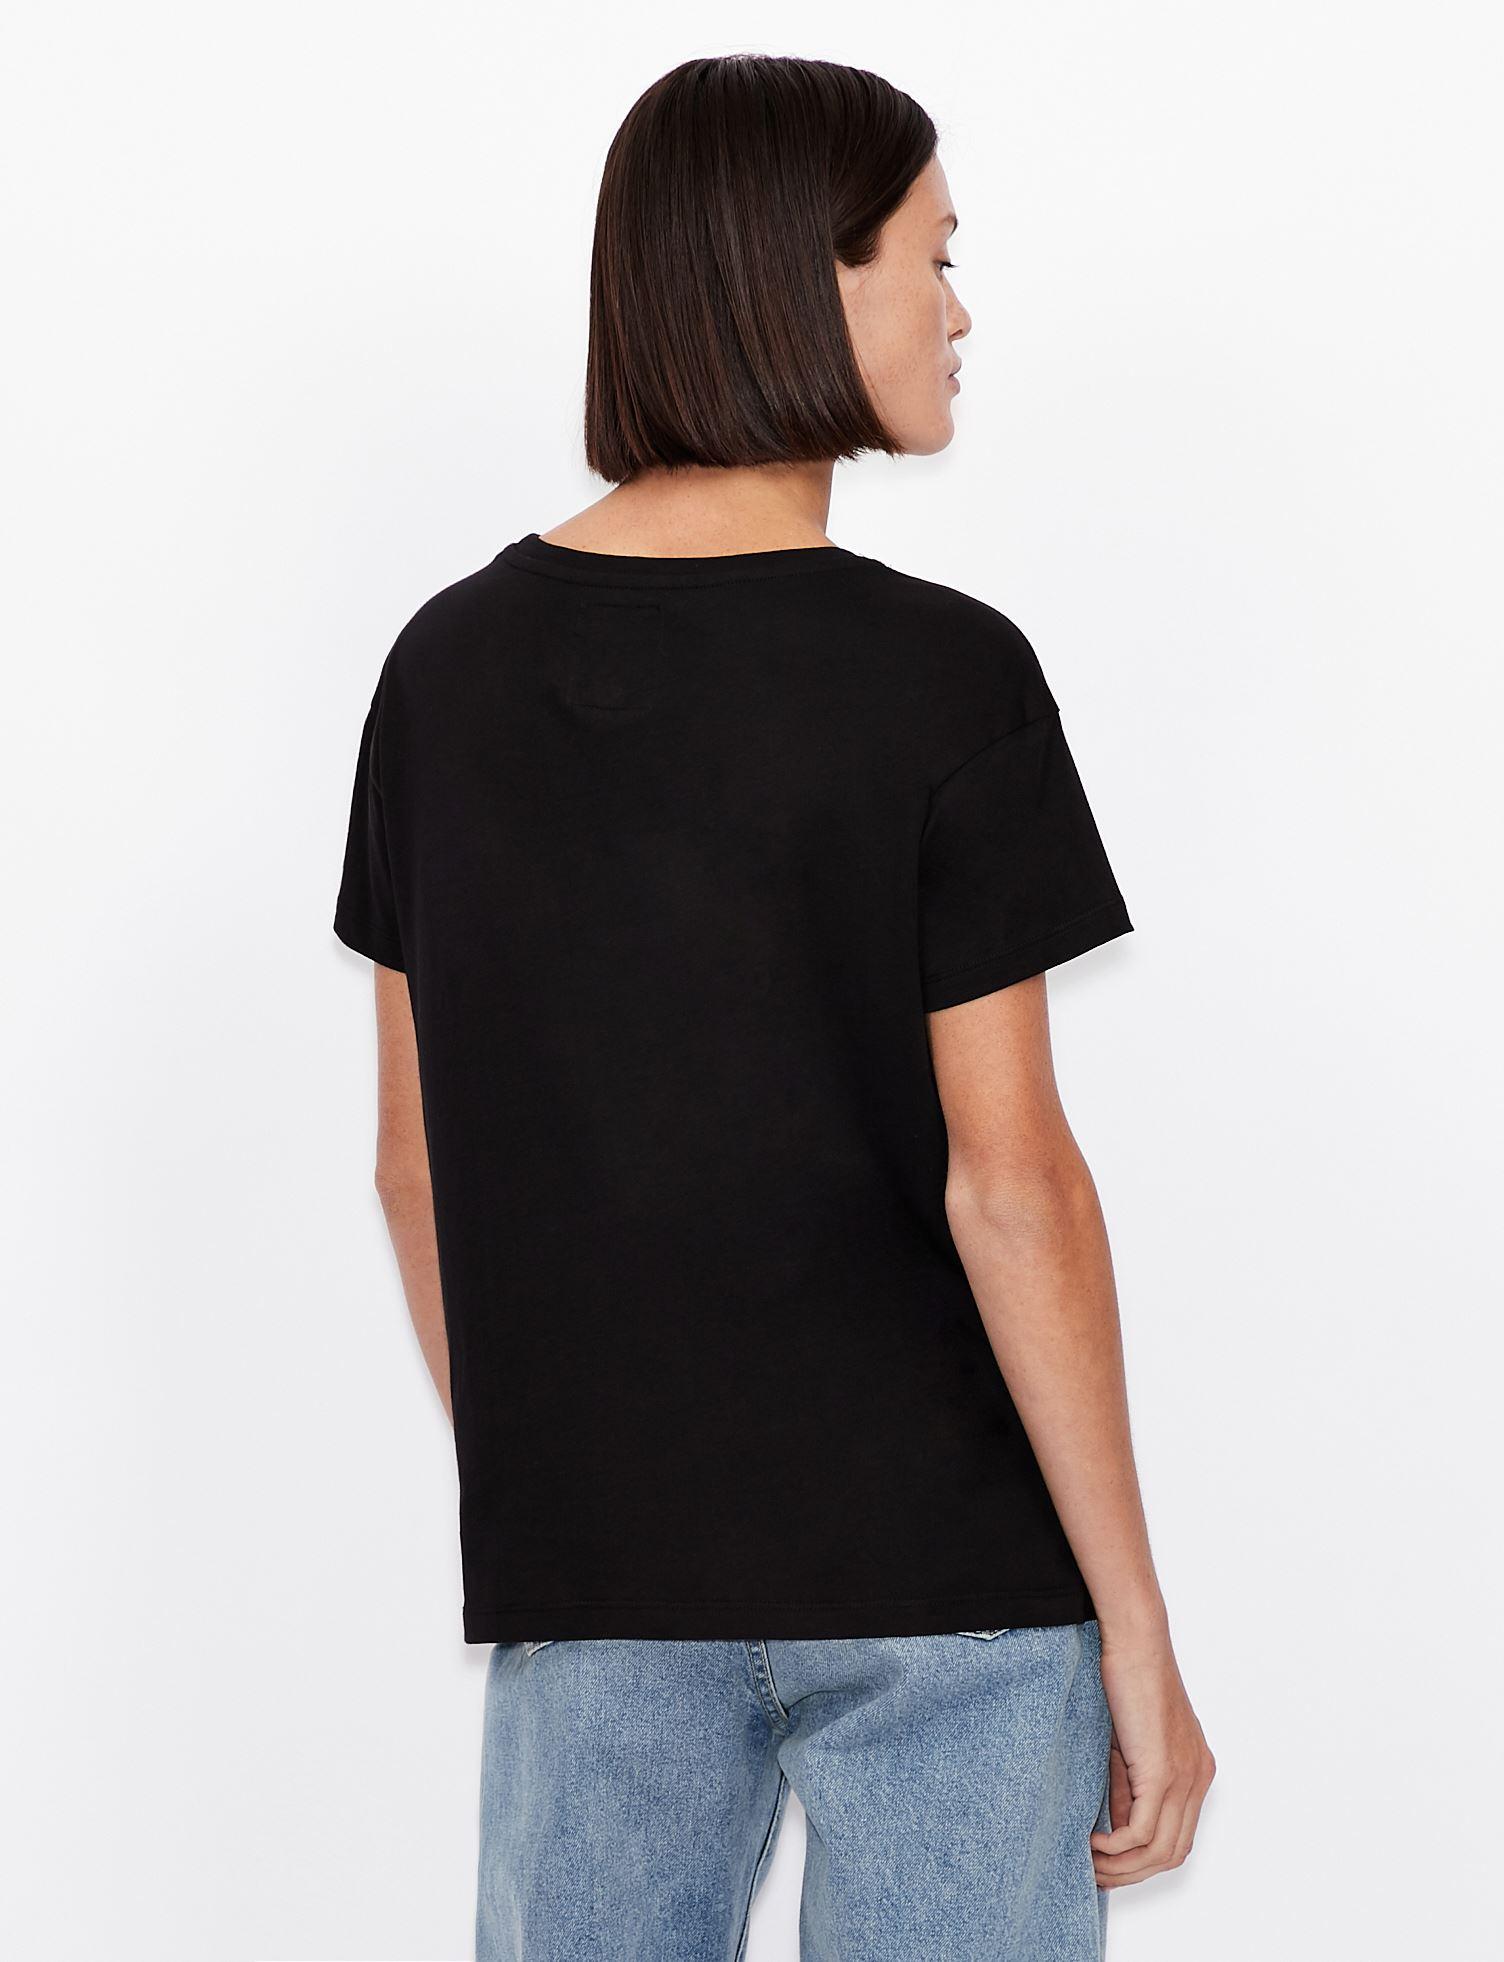 T-shirt Icon Period ARMANI EXCHANGE   T-shirt   8NYTCX-YJG3Z1200